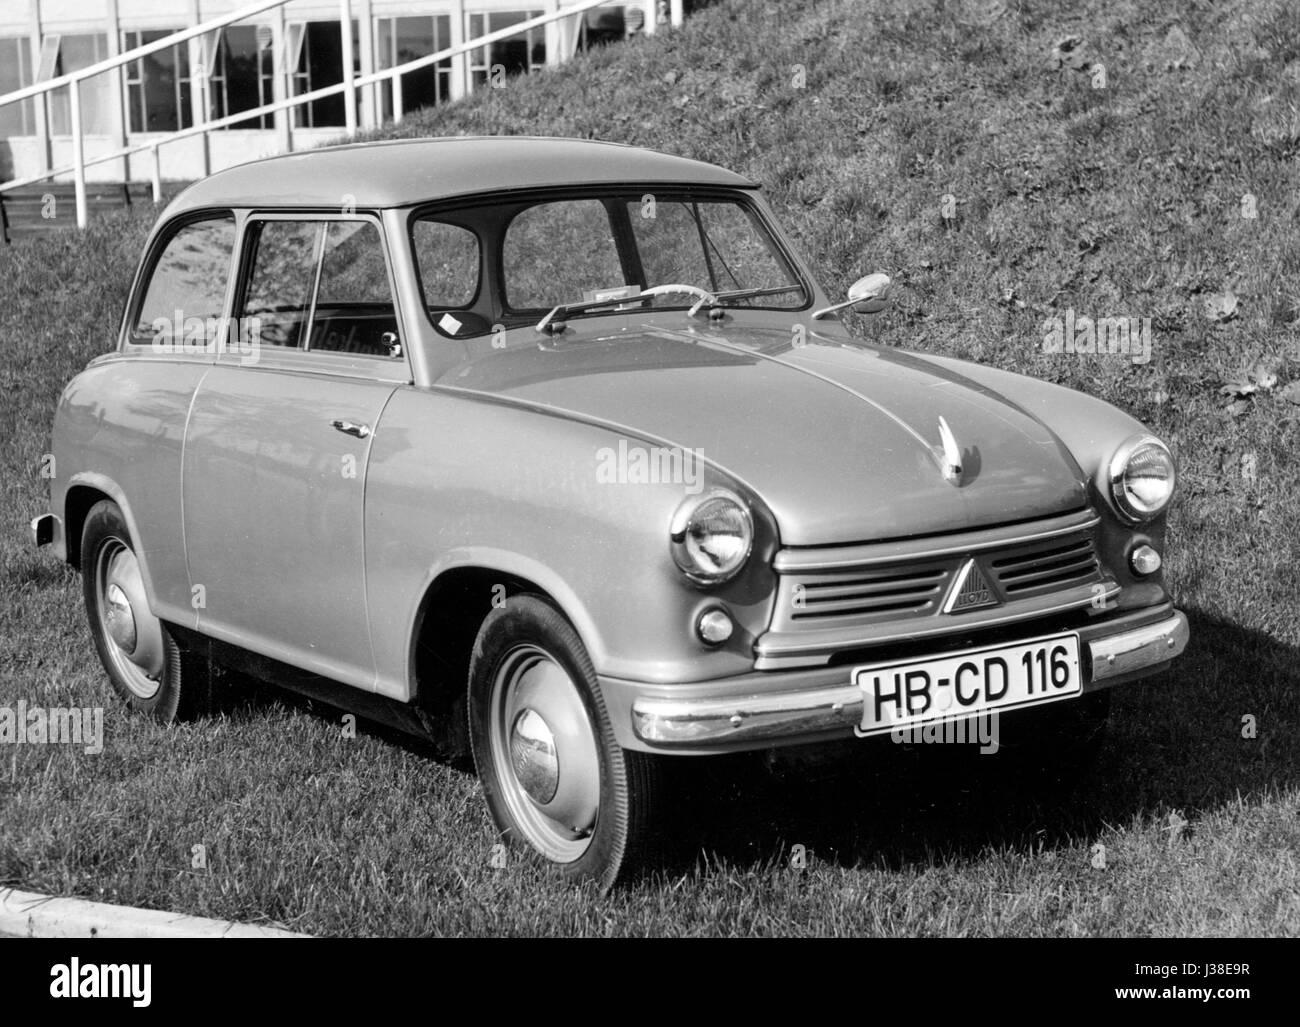 1958 Lloyd 600 - Stock Image